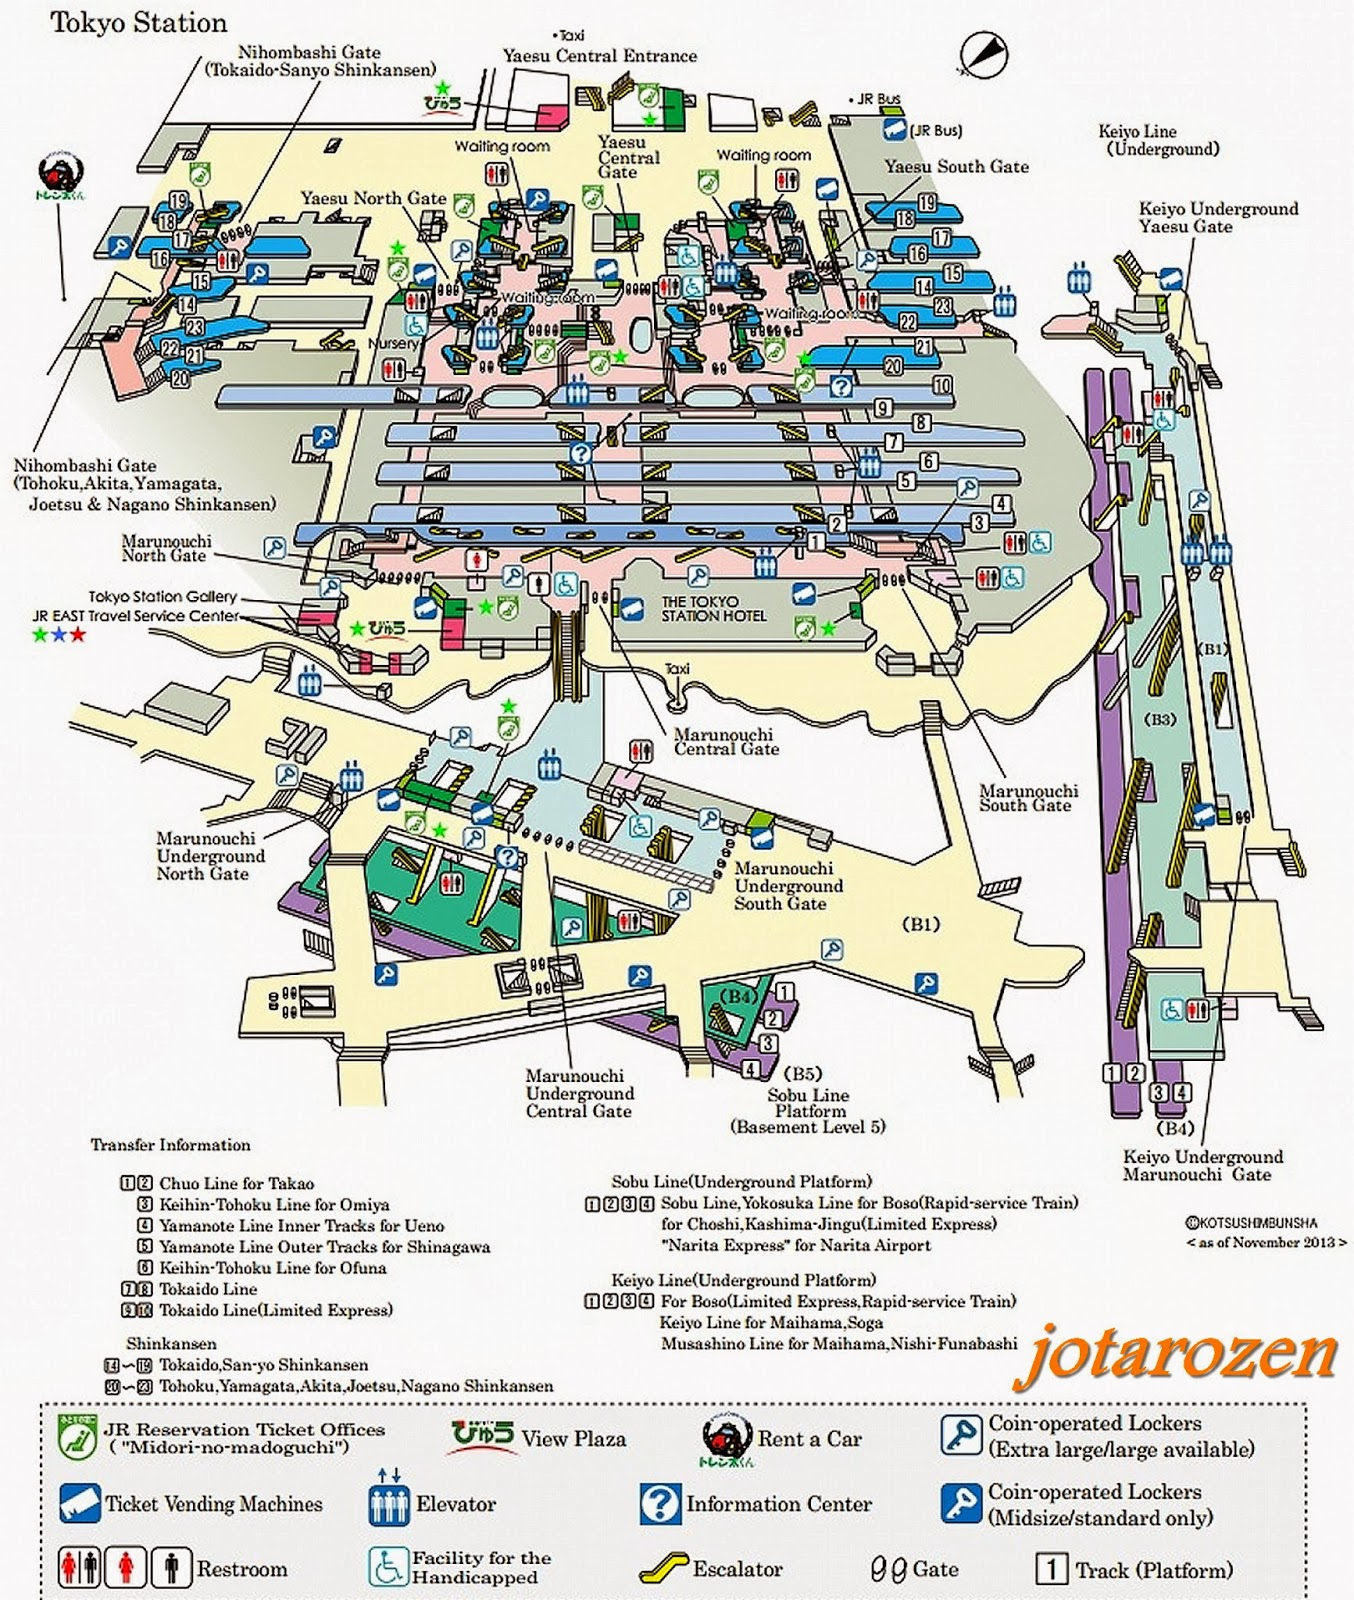 Footsteps jotaros travels travel tips japantokyo kamakura map of tokyo station click here for pdf copy fandeluxe Document